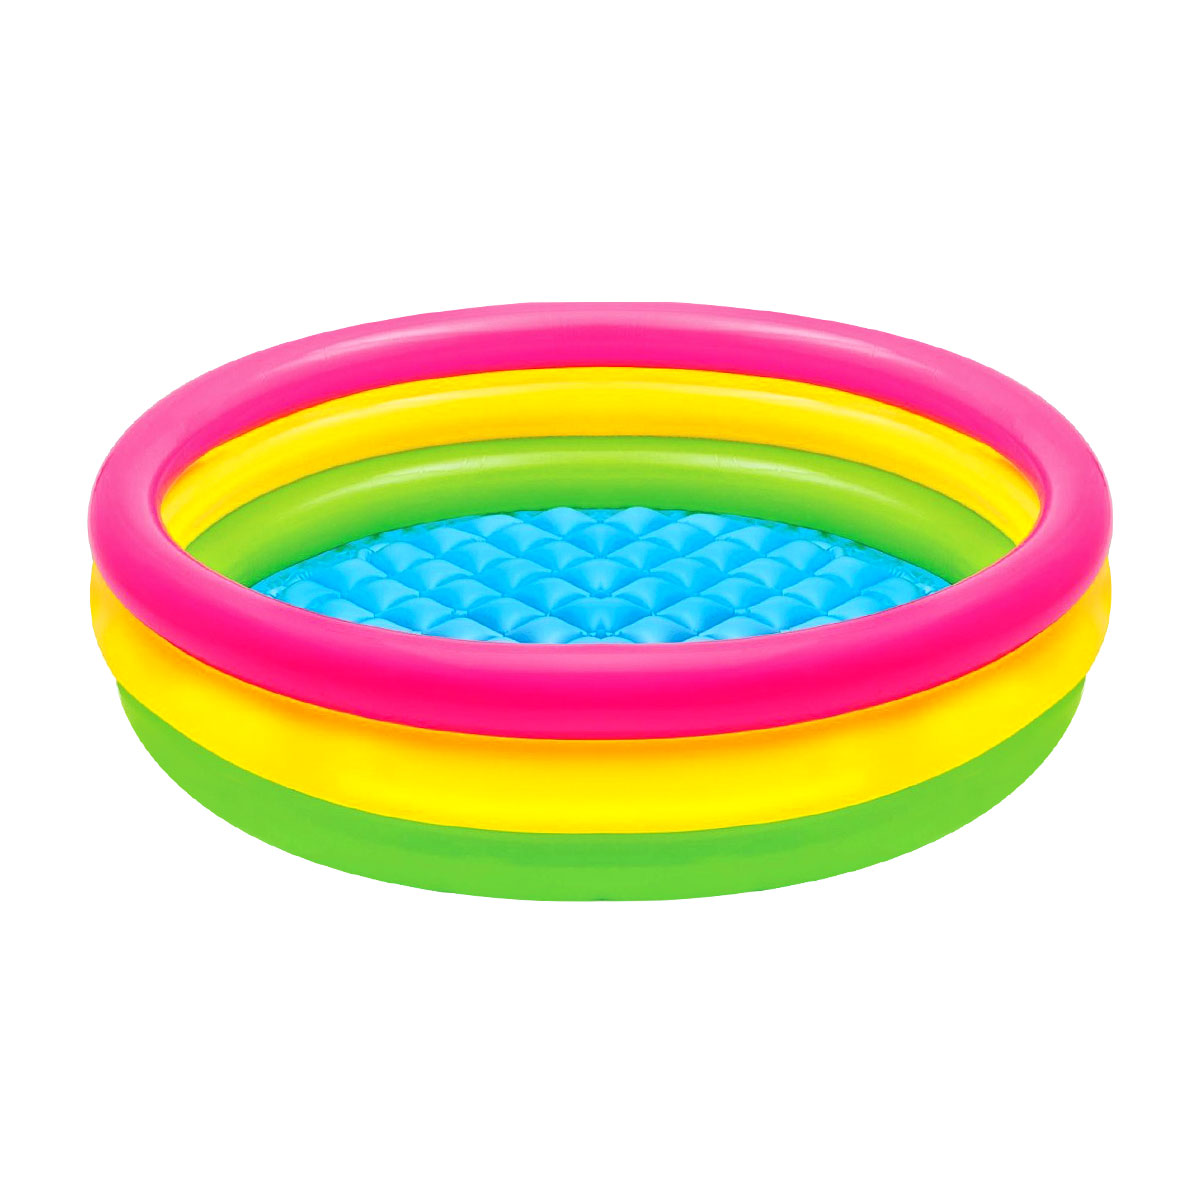 بركة سباحة دائري ملون للاطفال رقم 57422NP